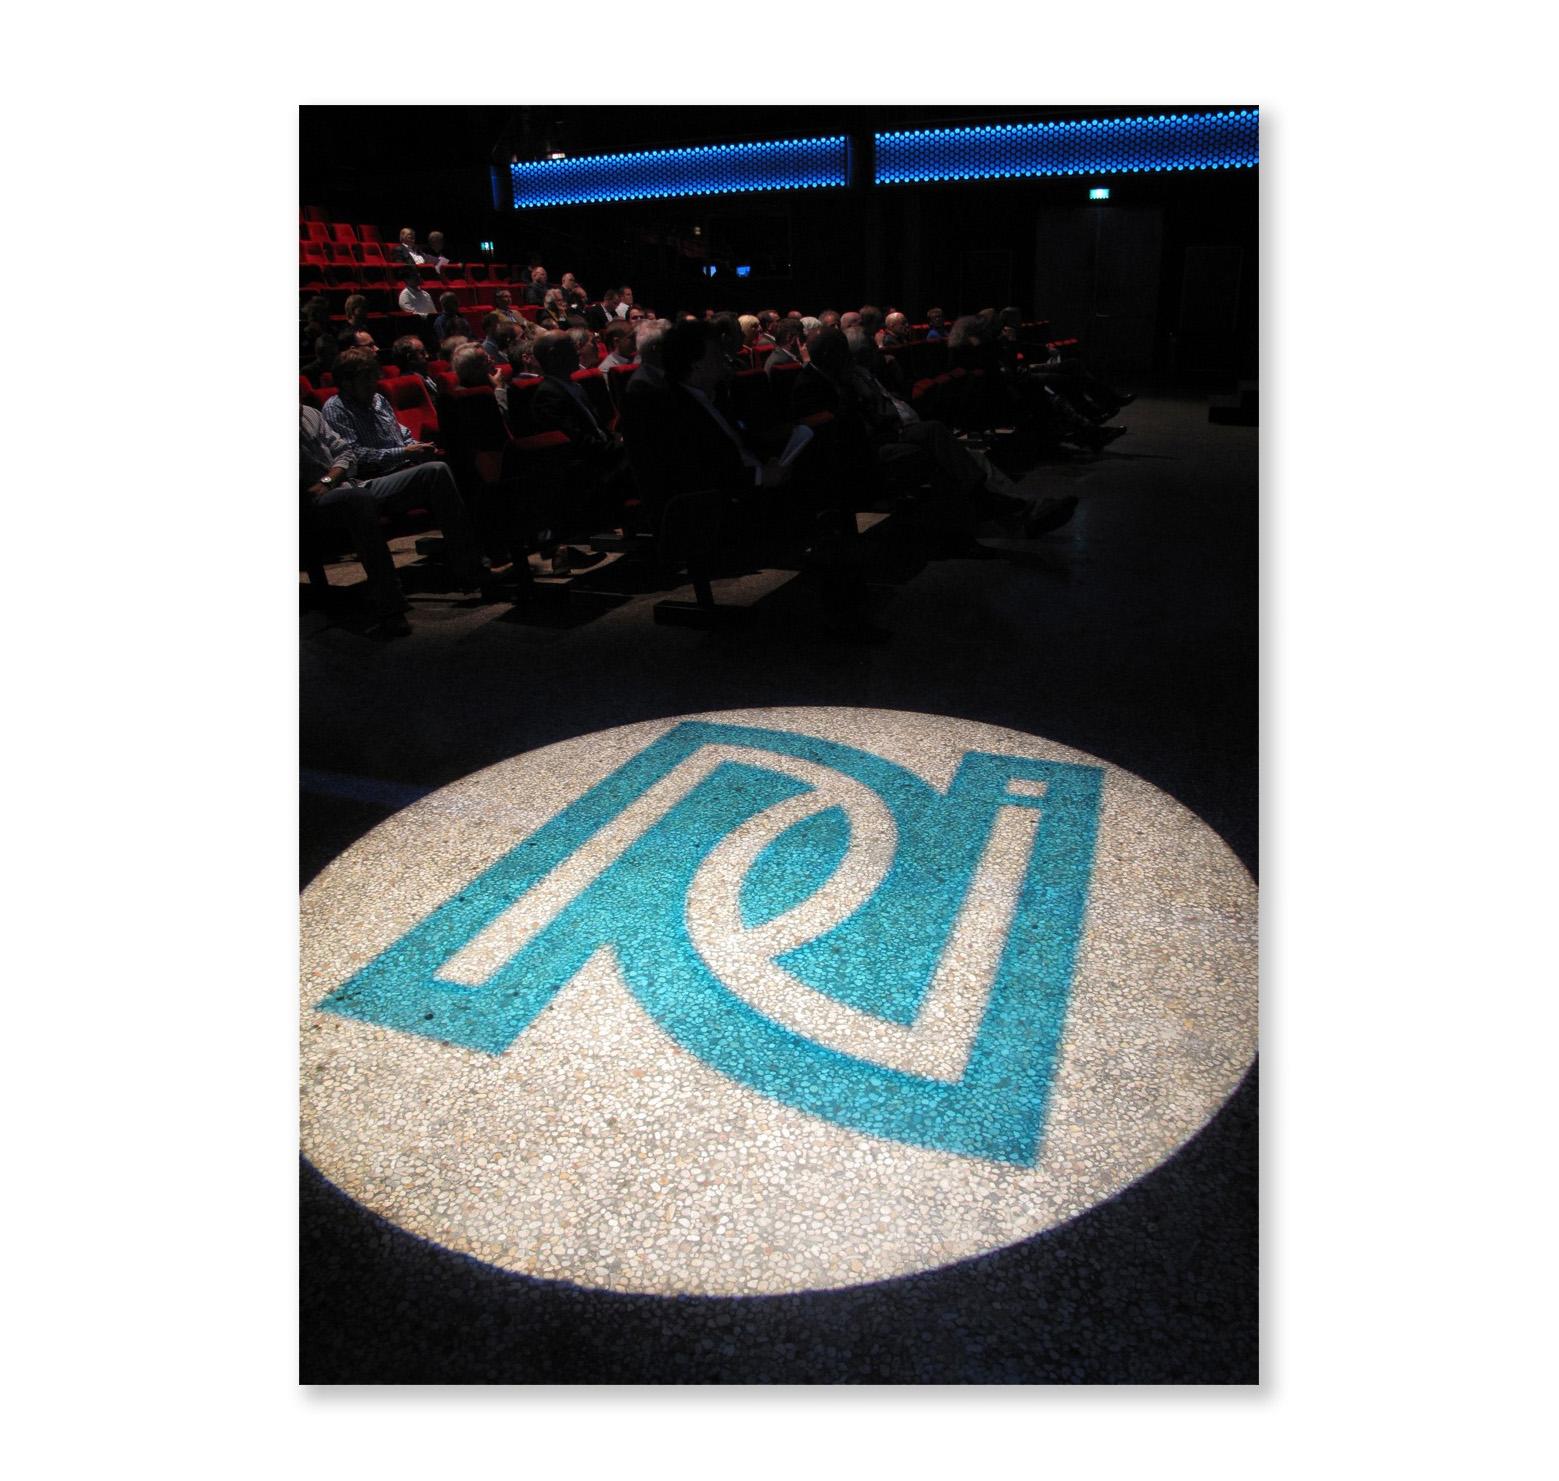 Nieman-projectie-logo-Spant